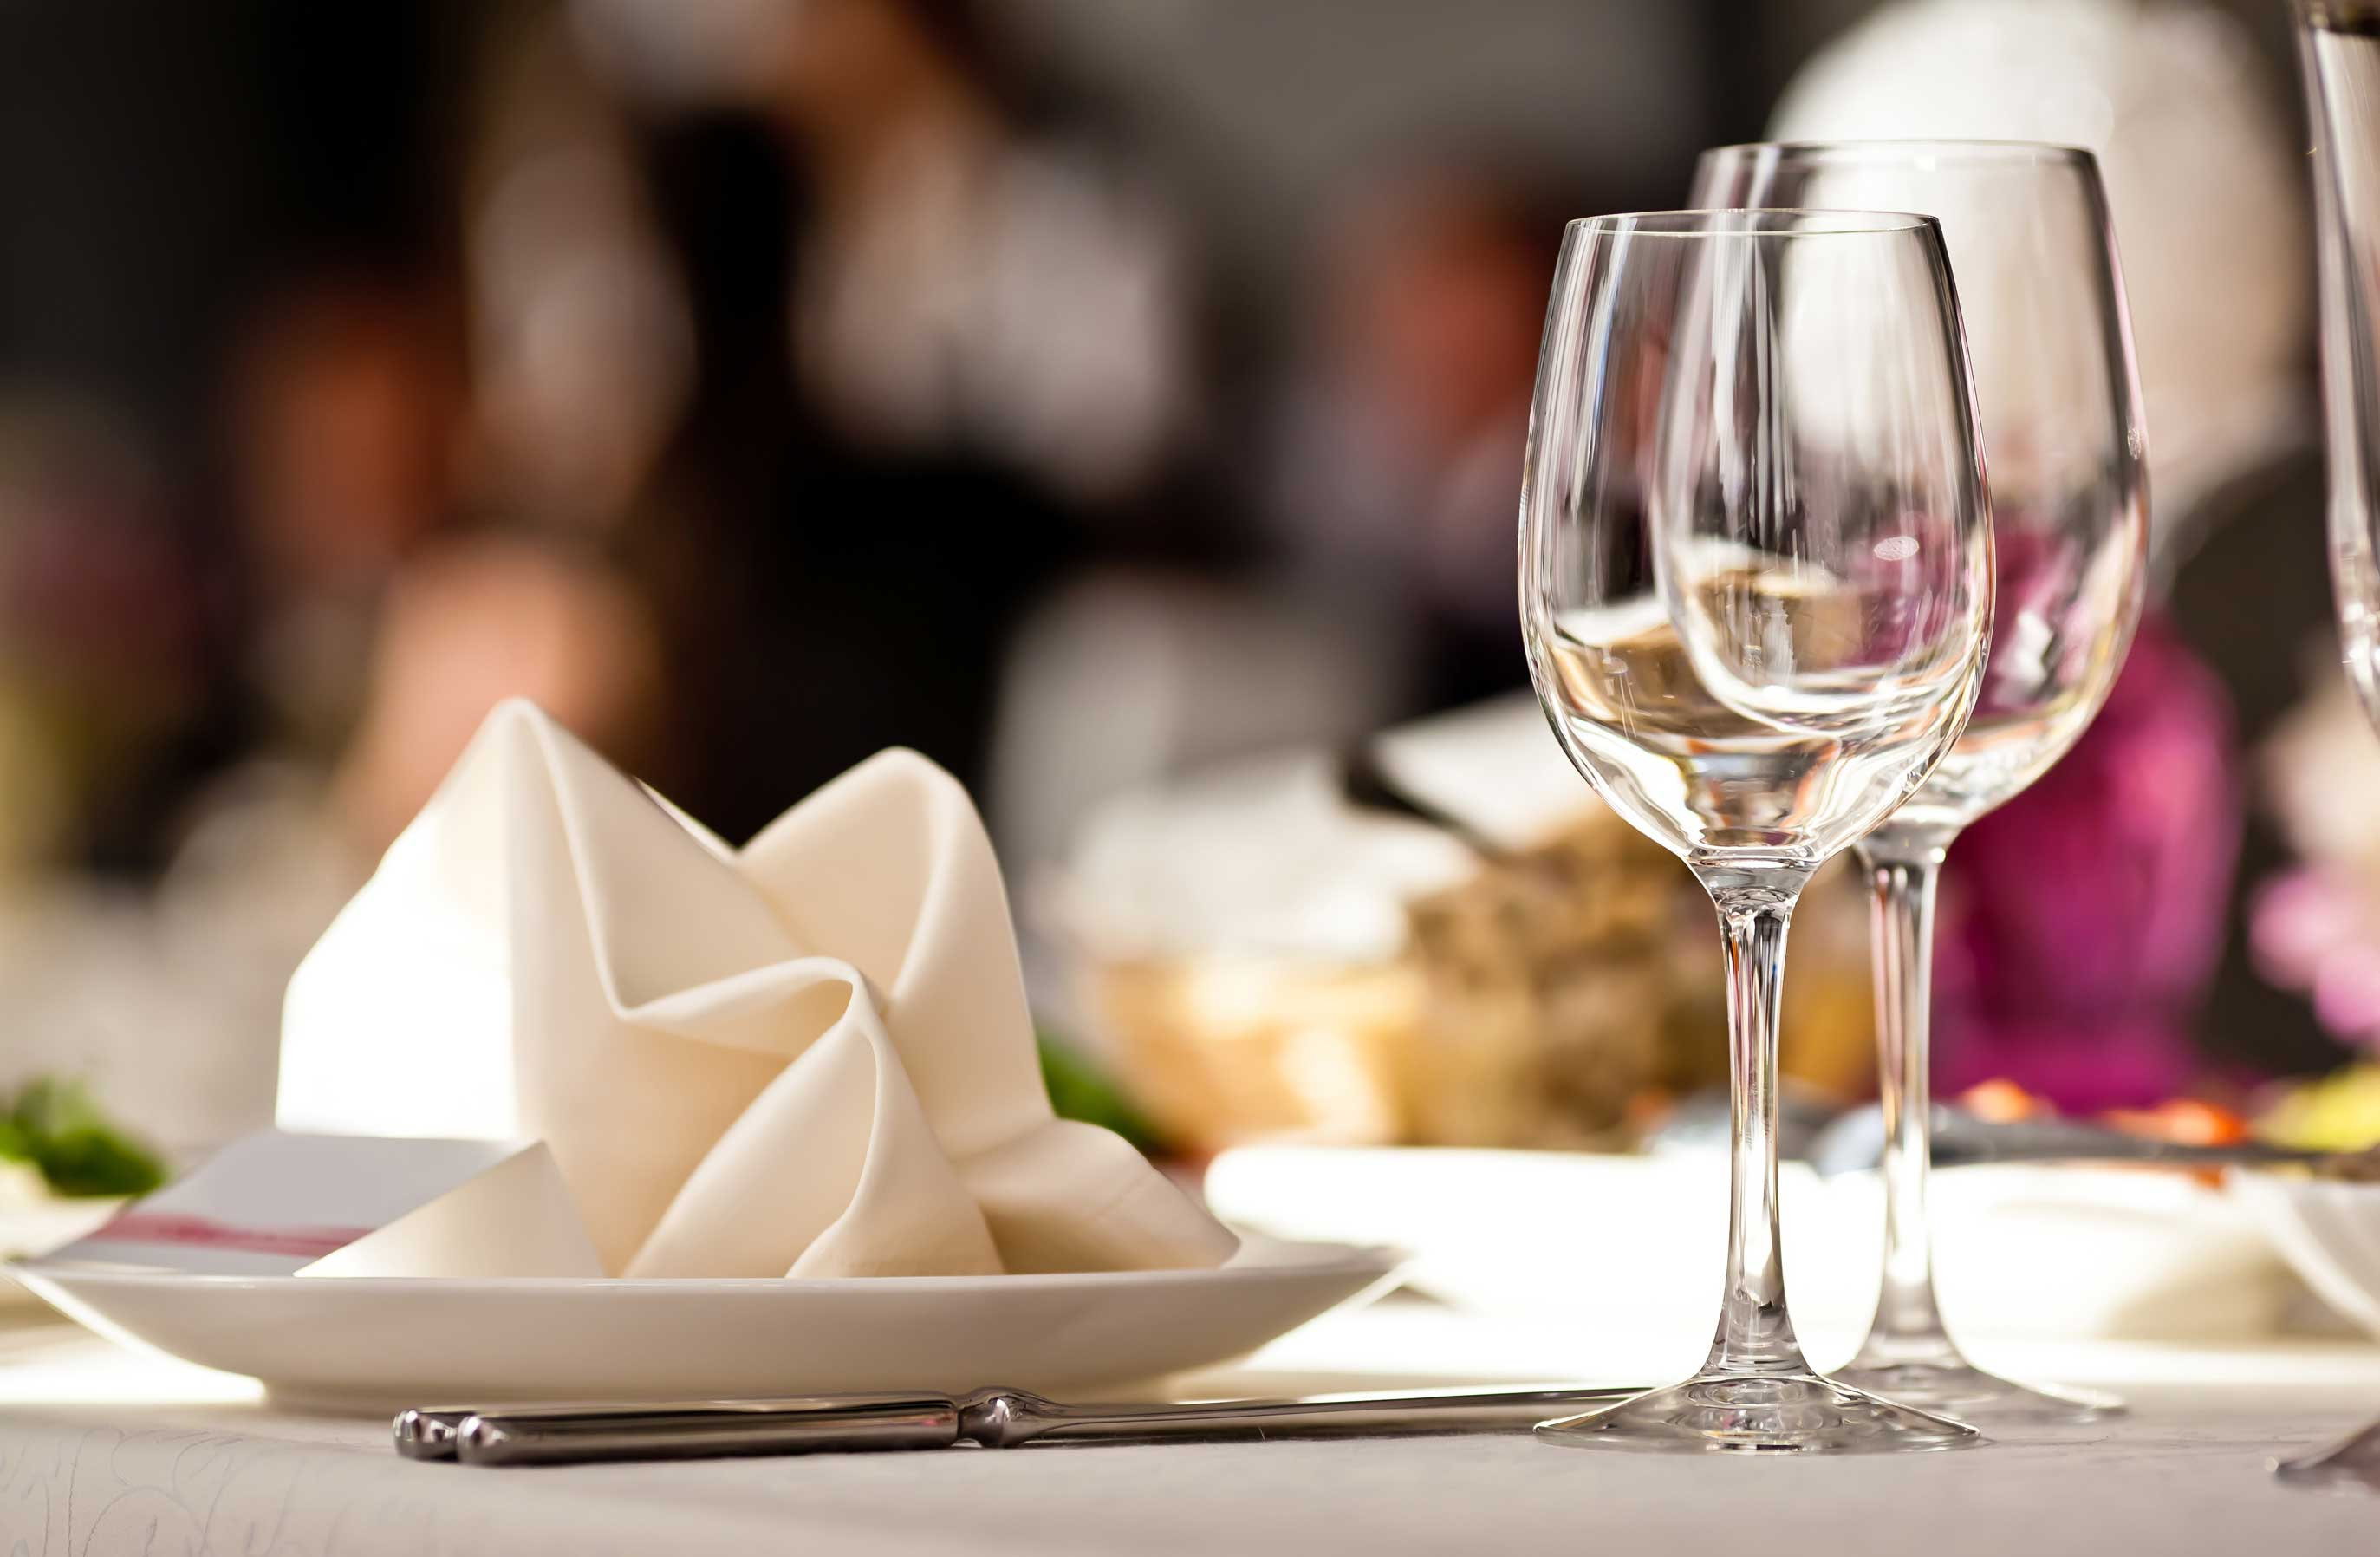 empty-glasses-set-in-restaurant-marketplace-brunswick-crossing-new-homes-frederick-maryland.jpg